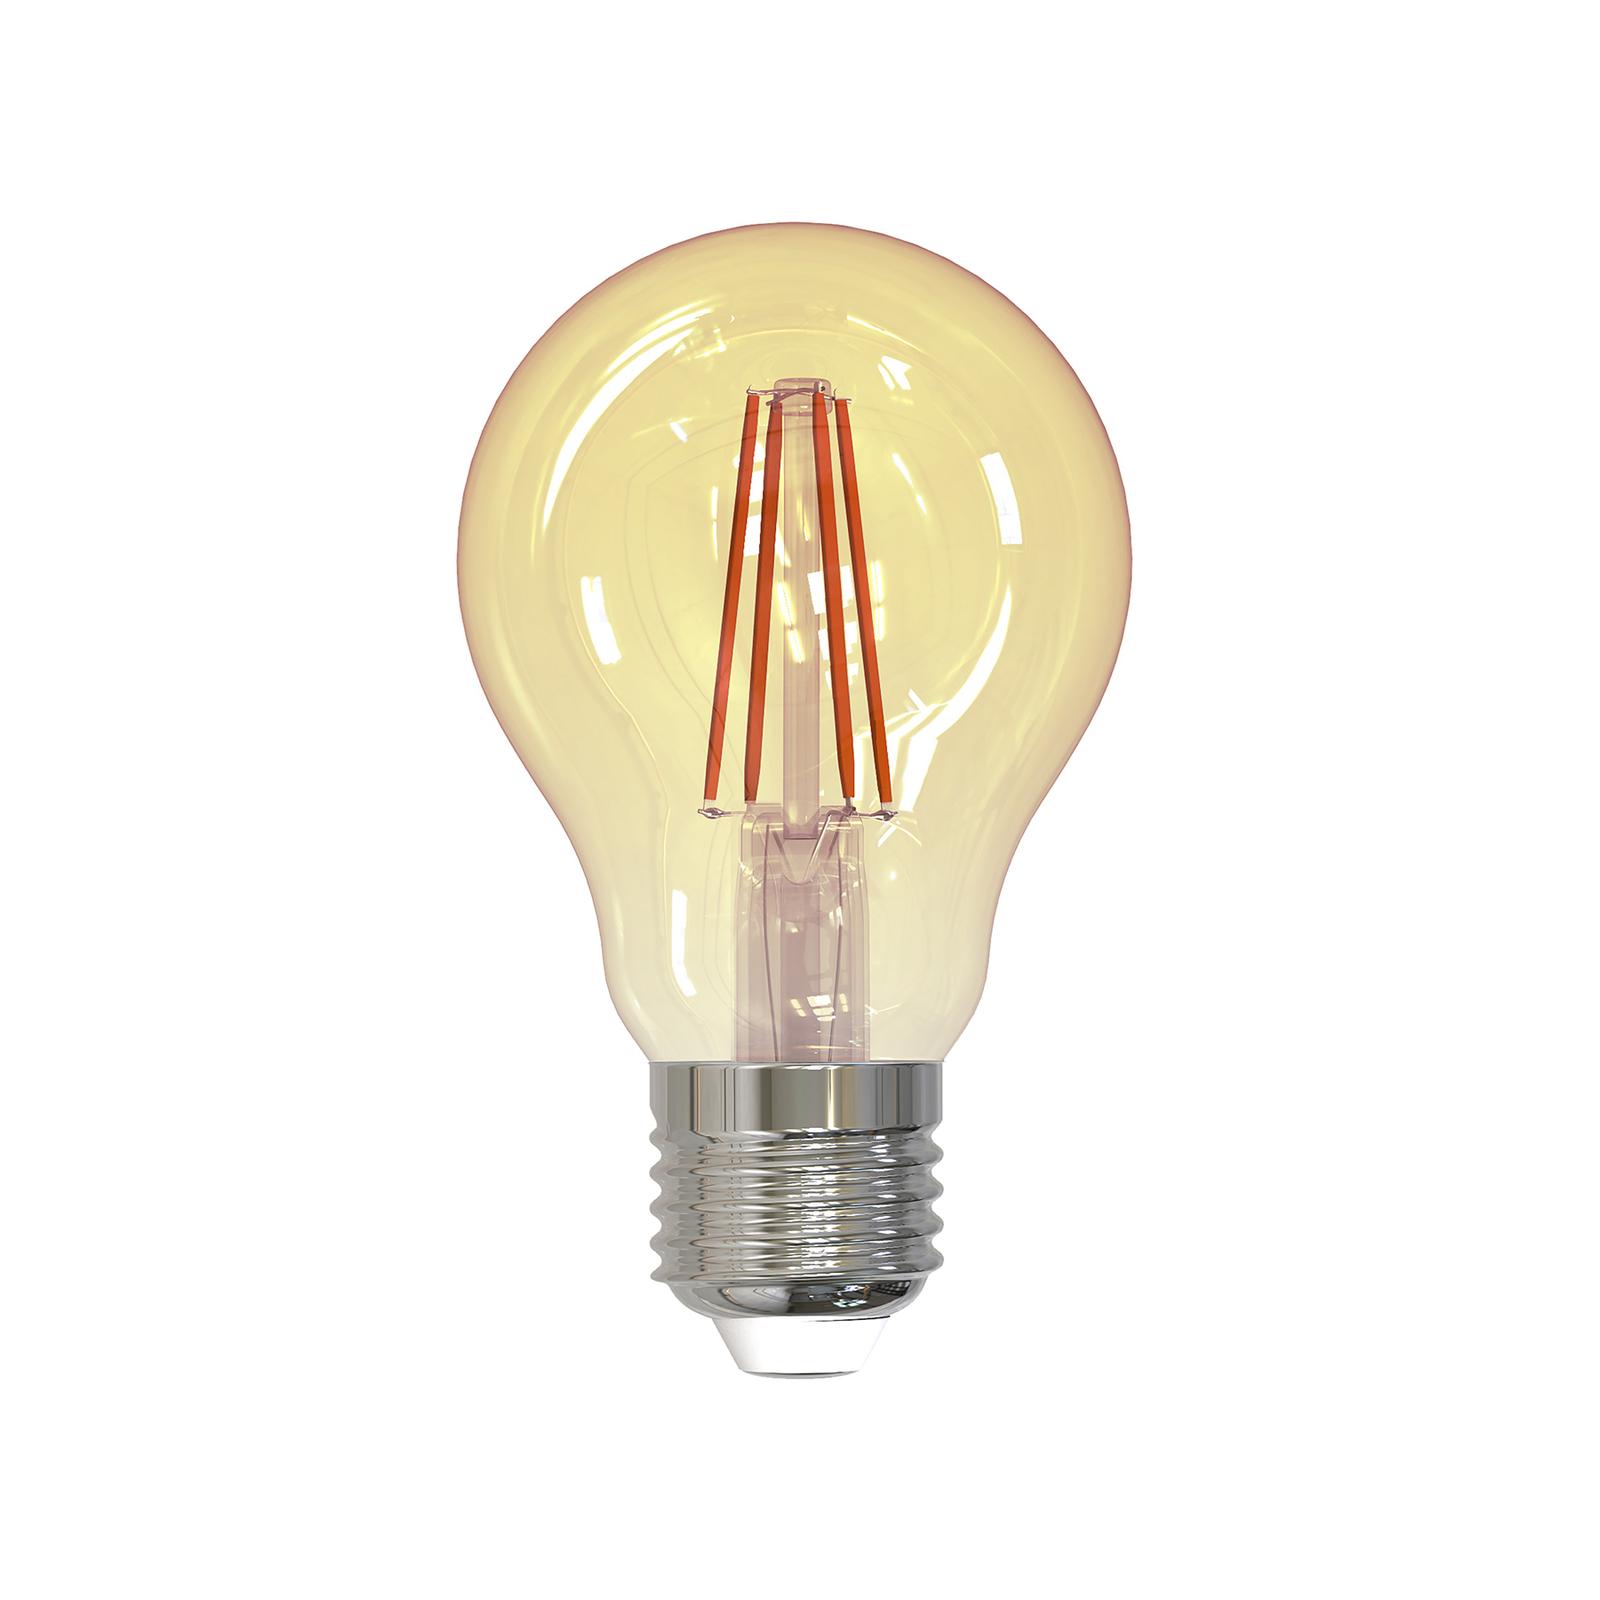 LED-filamentpære E27 4,5W 2000K 400lm gull